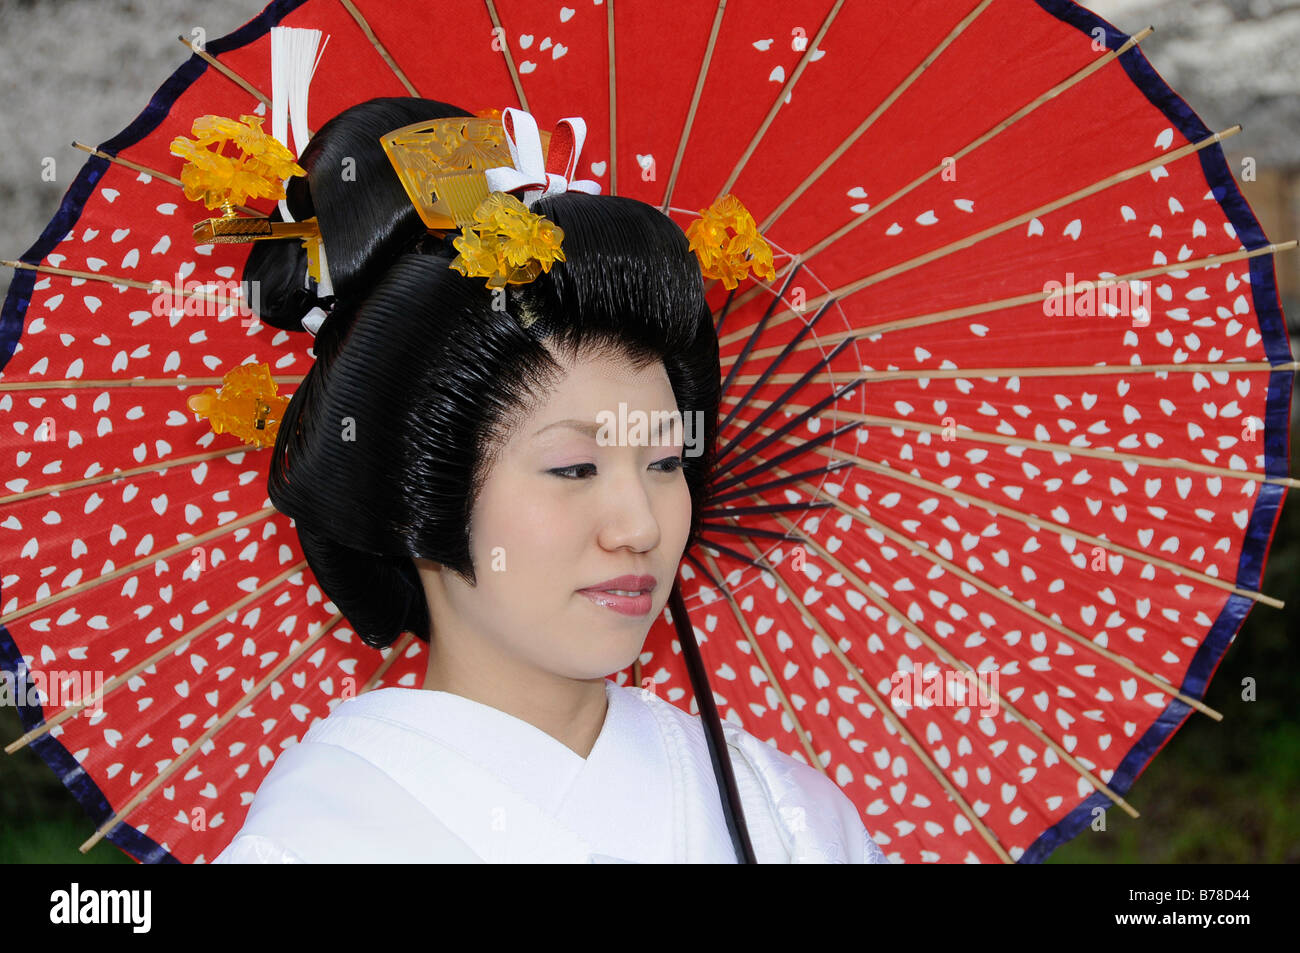 bride wearing a wedding kimono holding a traditional paper parasol